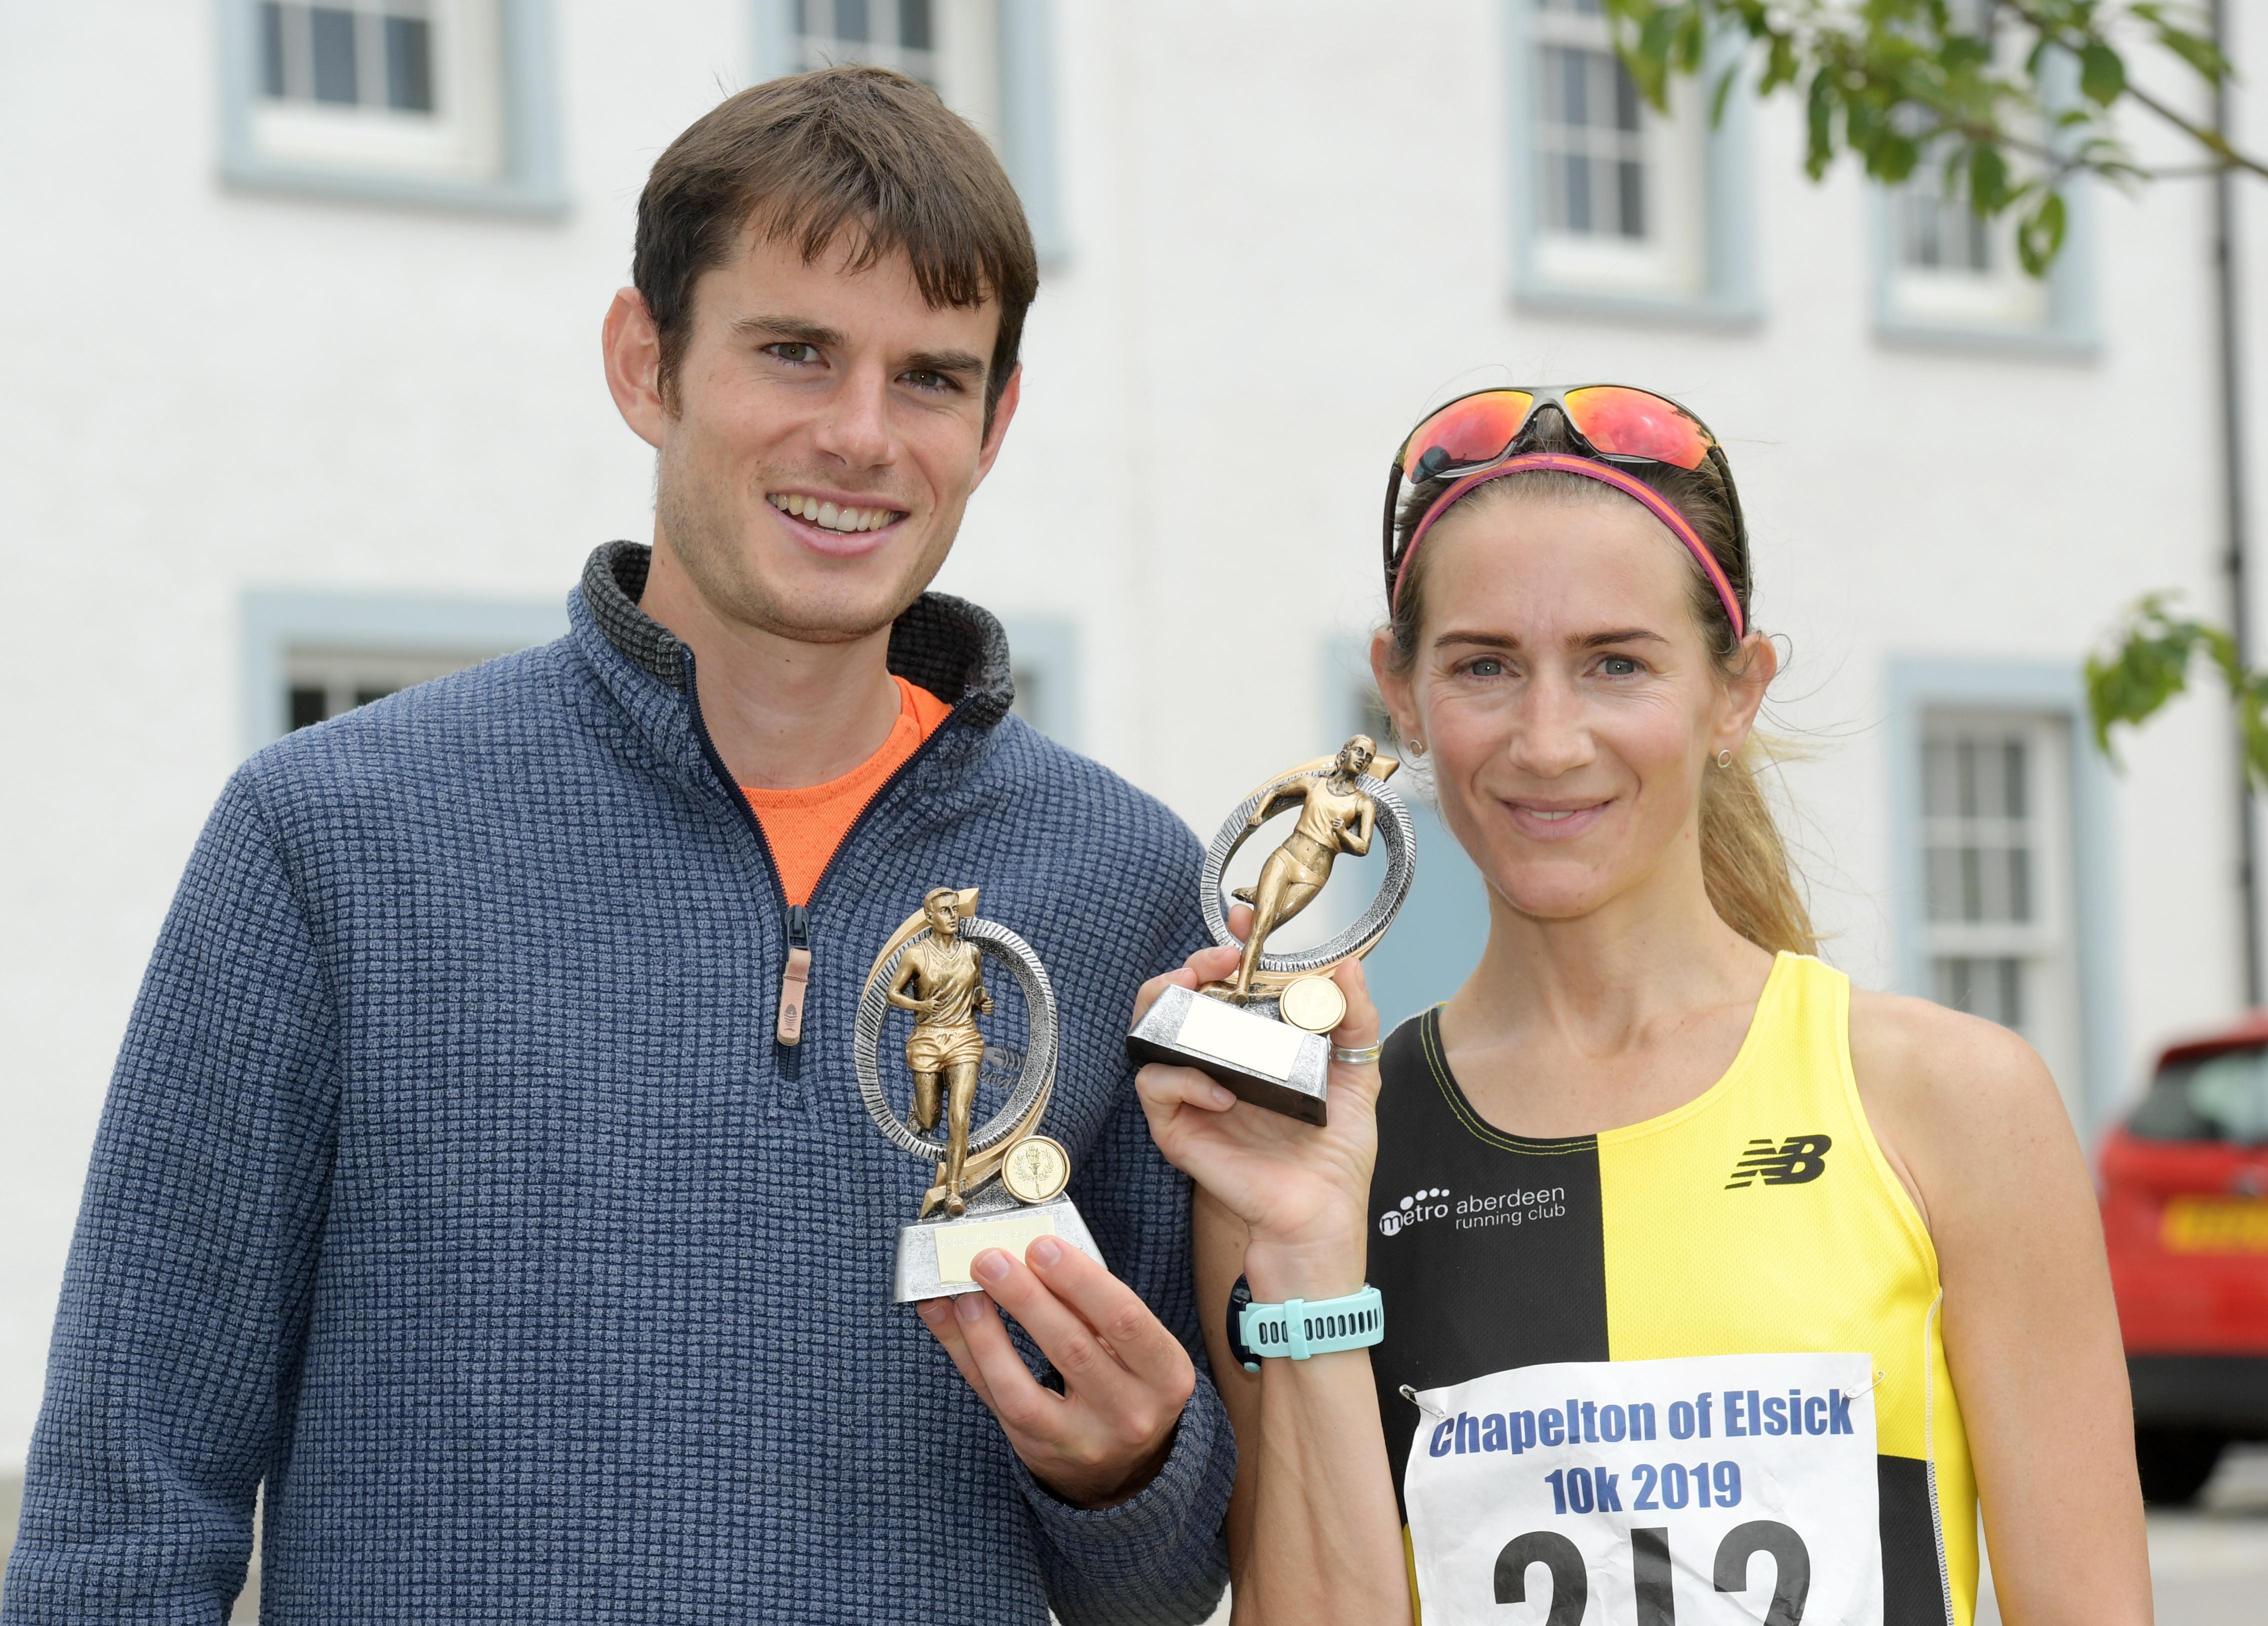 Men's winner Robbie Simpson and winner of the women's race Alison Matthews